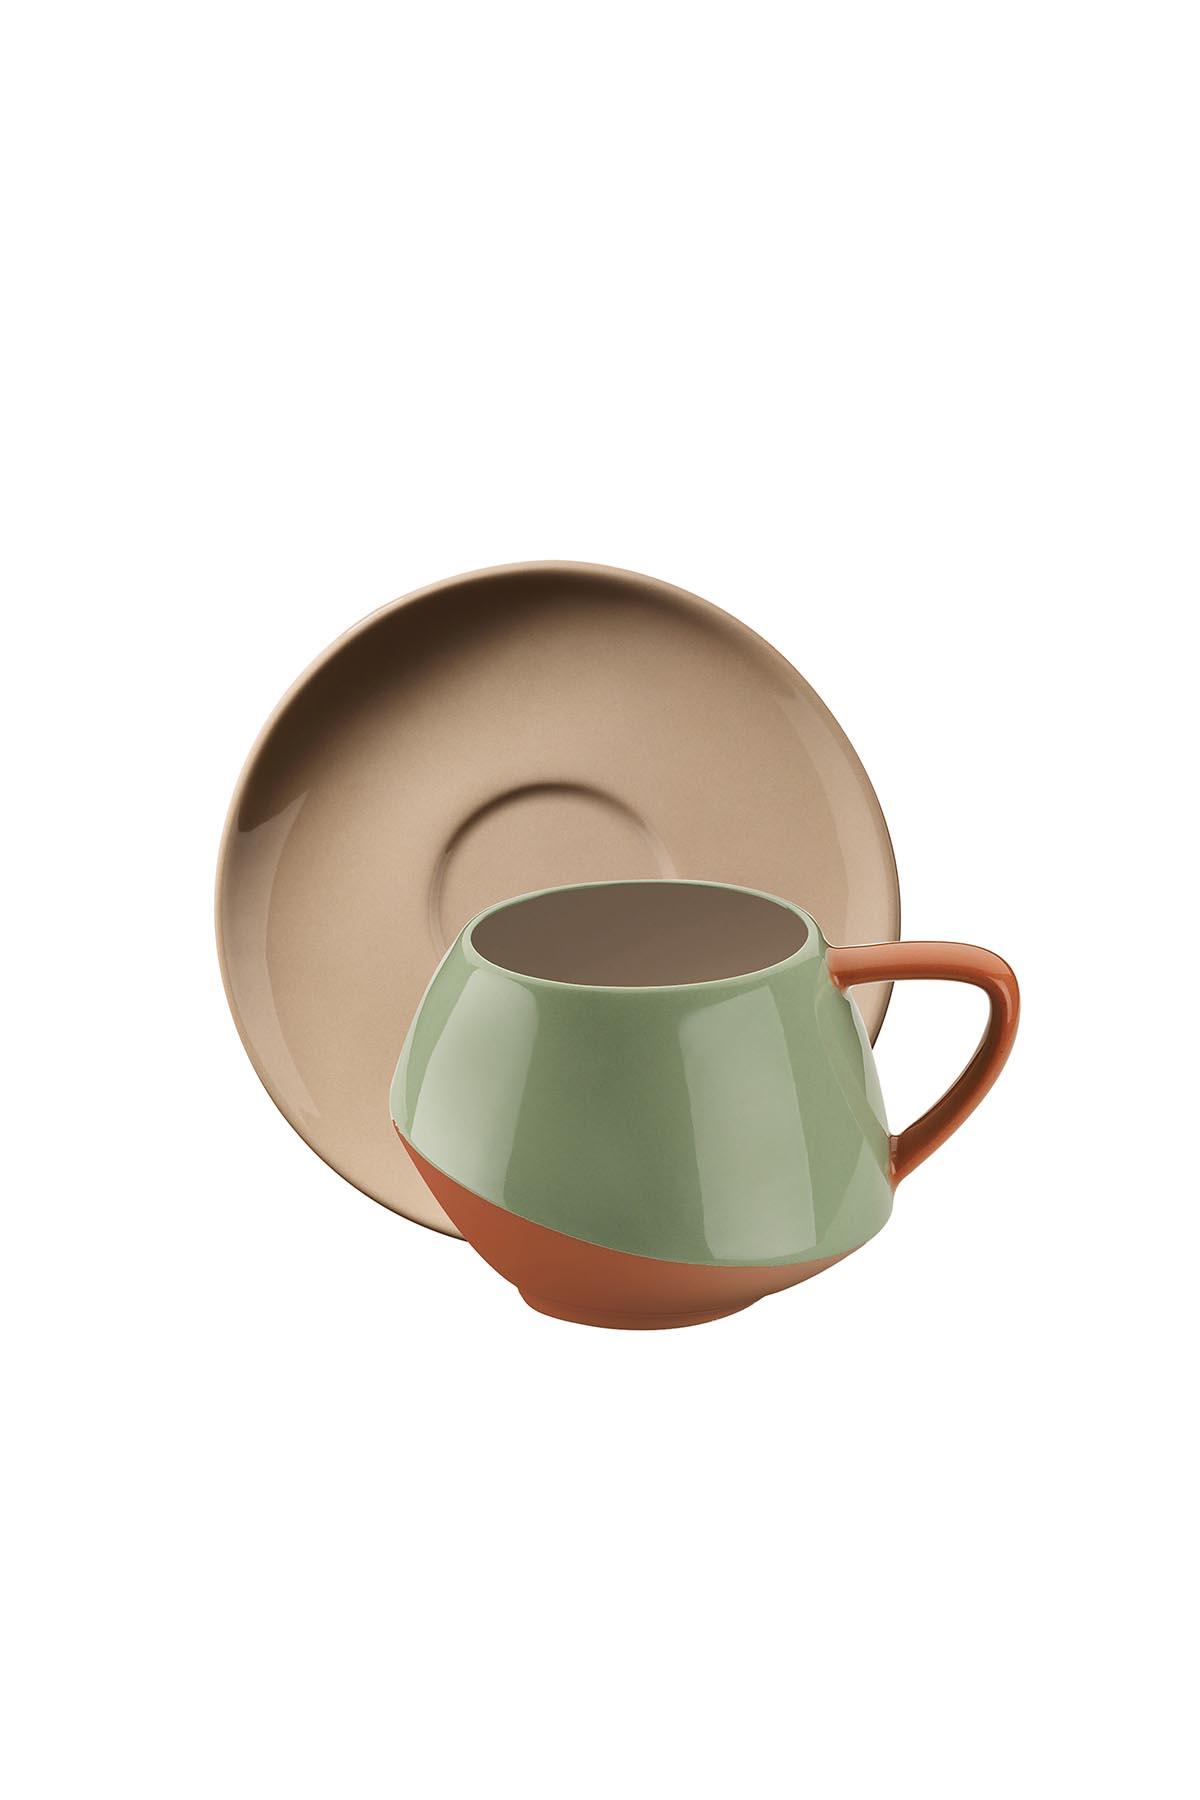 - Aura Çay Takımı Yeşil-Bej-Kırmızı